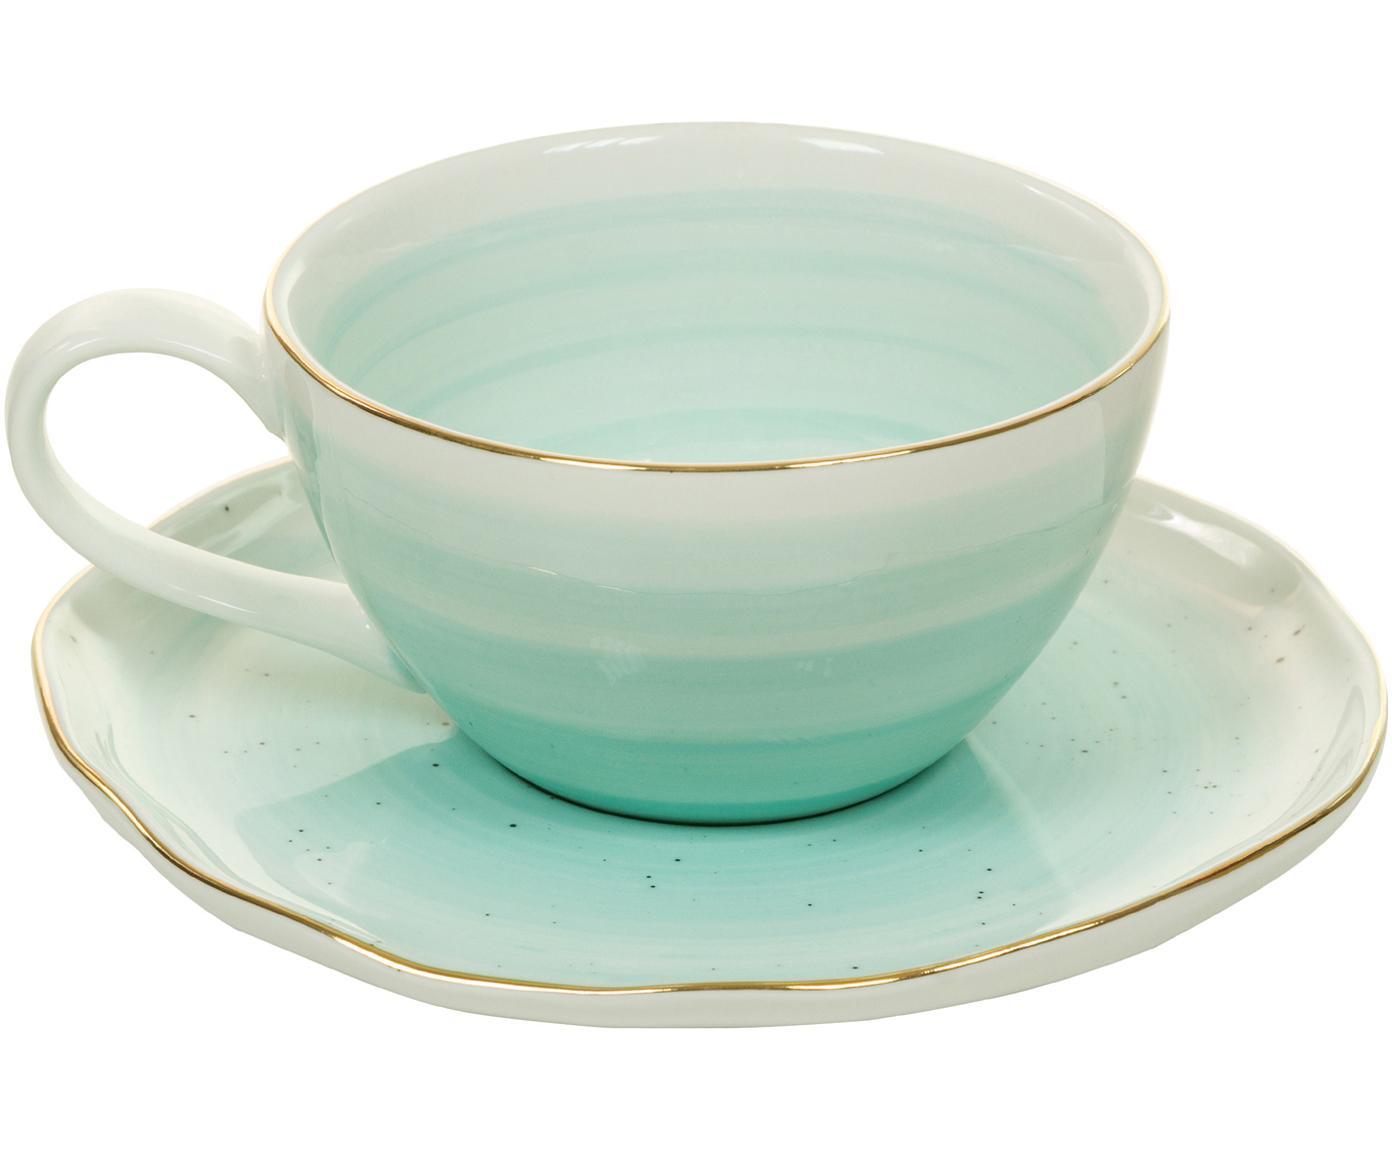 Handgefertigtes Tassen-Set Bol mit Goldrand, 4-tlg., Porzellan, Türkisblau, Ø 10 x H 6 cm